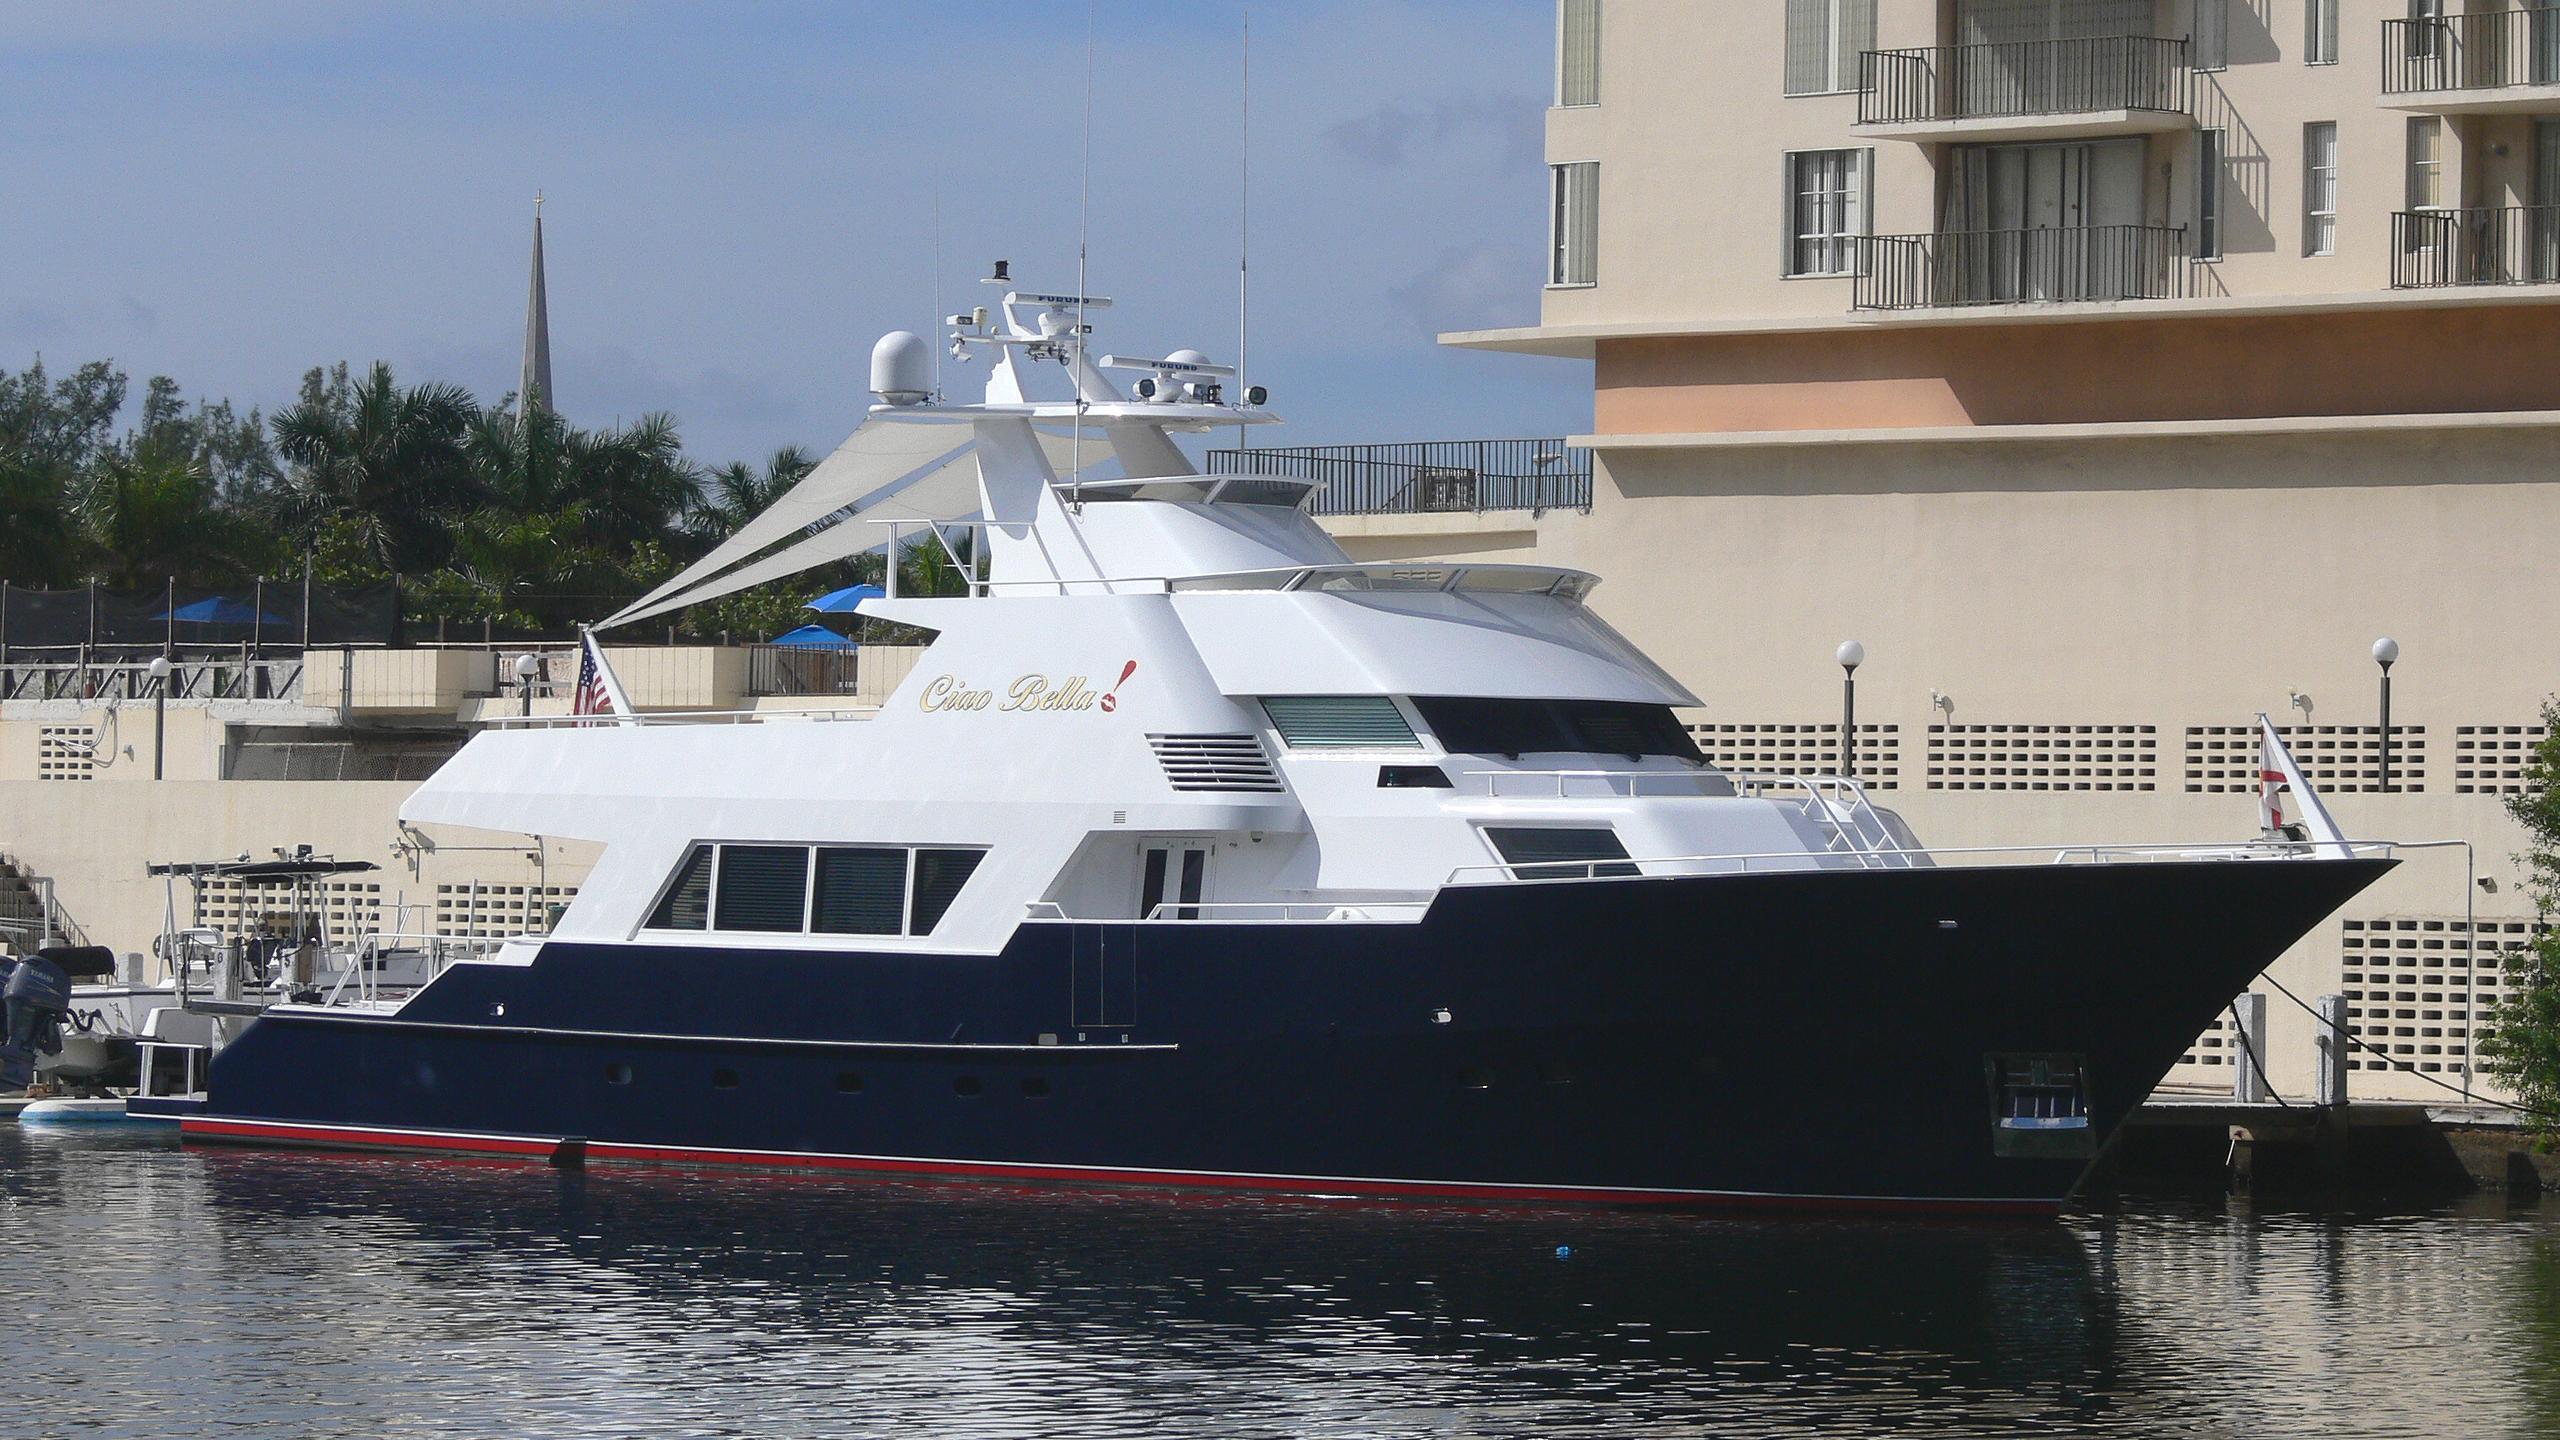 rogue pirate radio ciao bella motoryacht poole 32m 1983 half profile